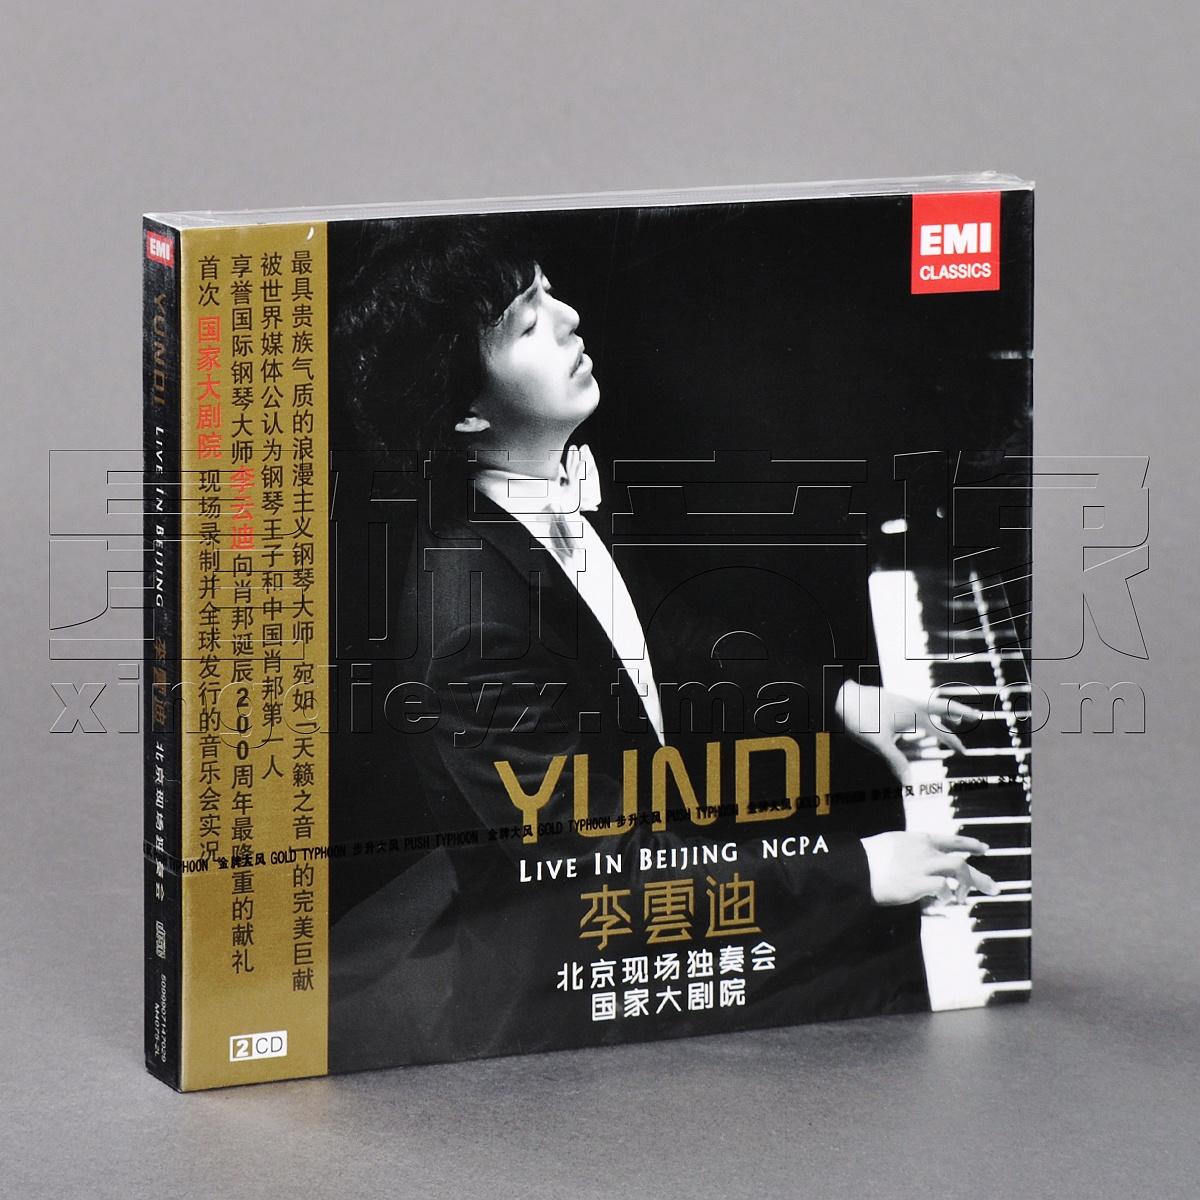 【促�N特�r】李云迪:2011 北京�F�霆�奏�� 2CD